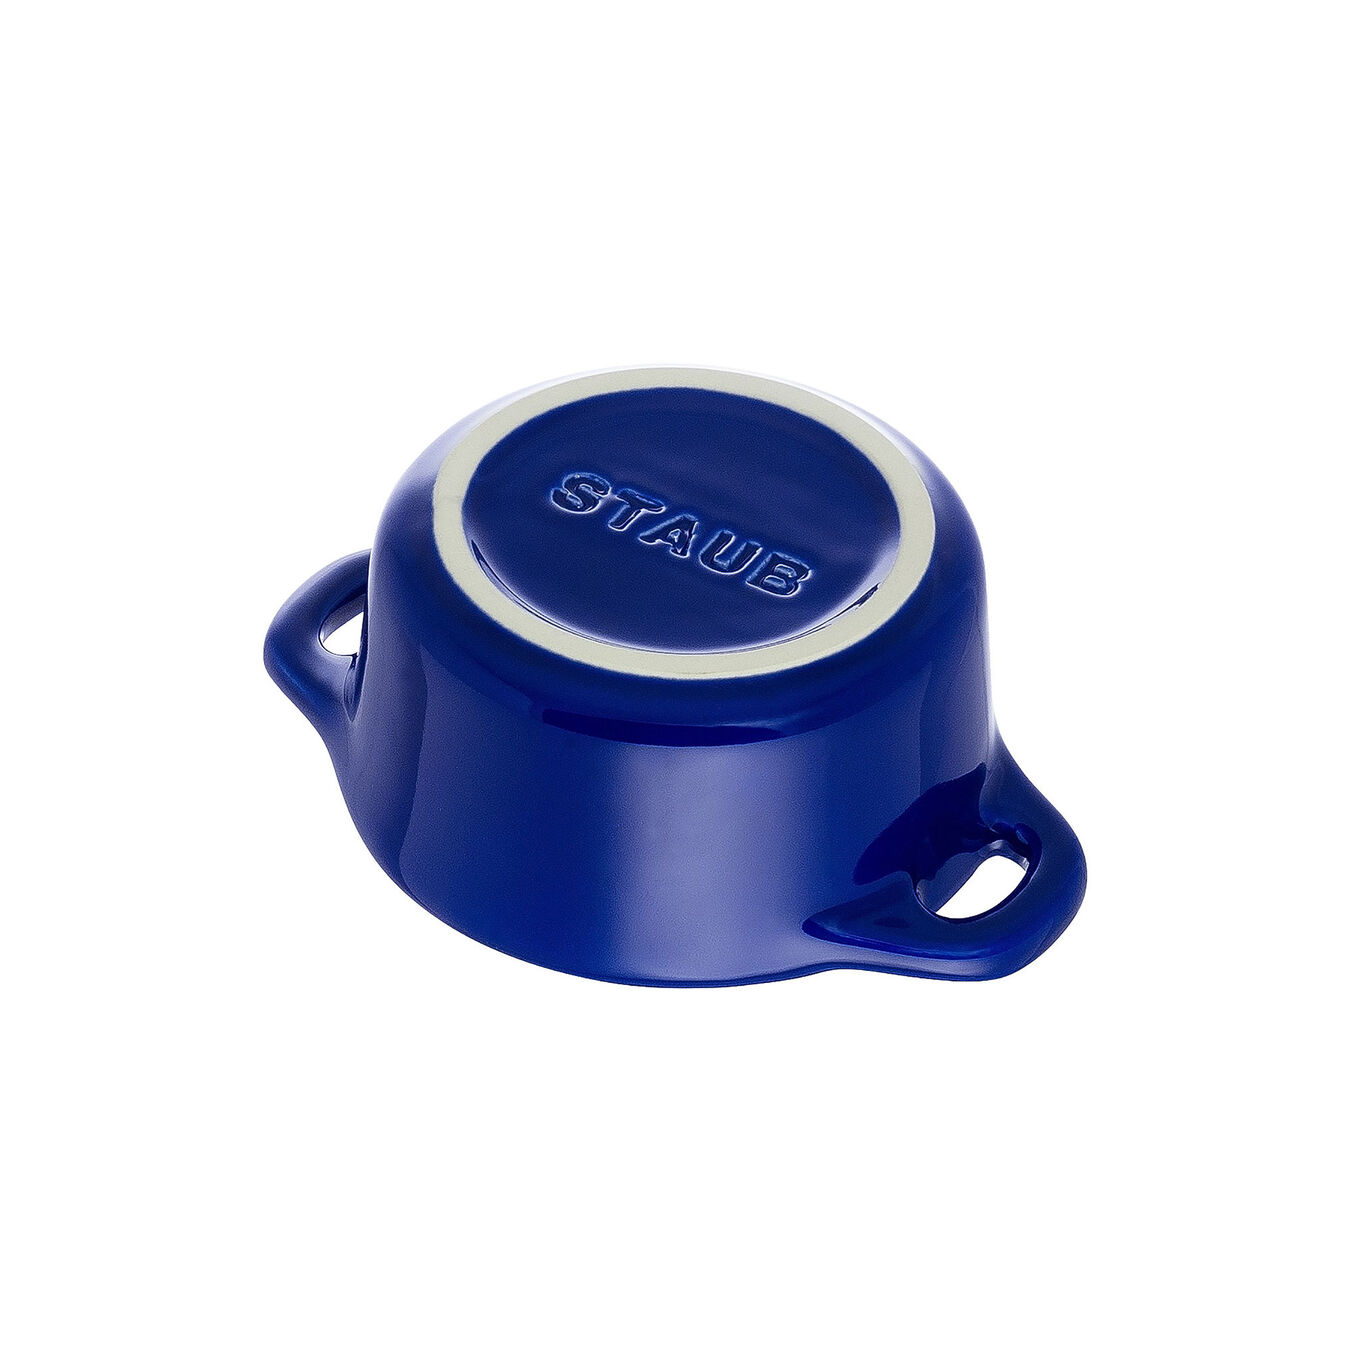 Mini Cocotte 10 cm, redondo, azul marinho, Cerâmica,,large 5